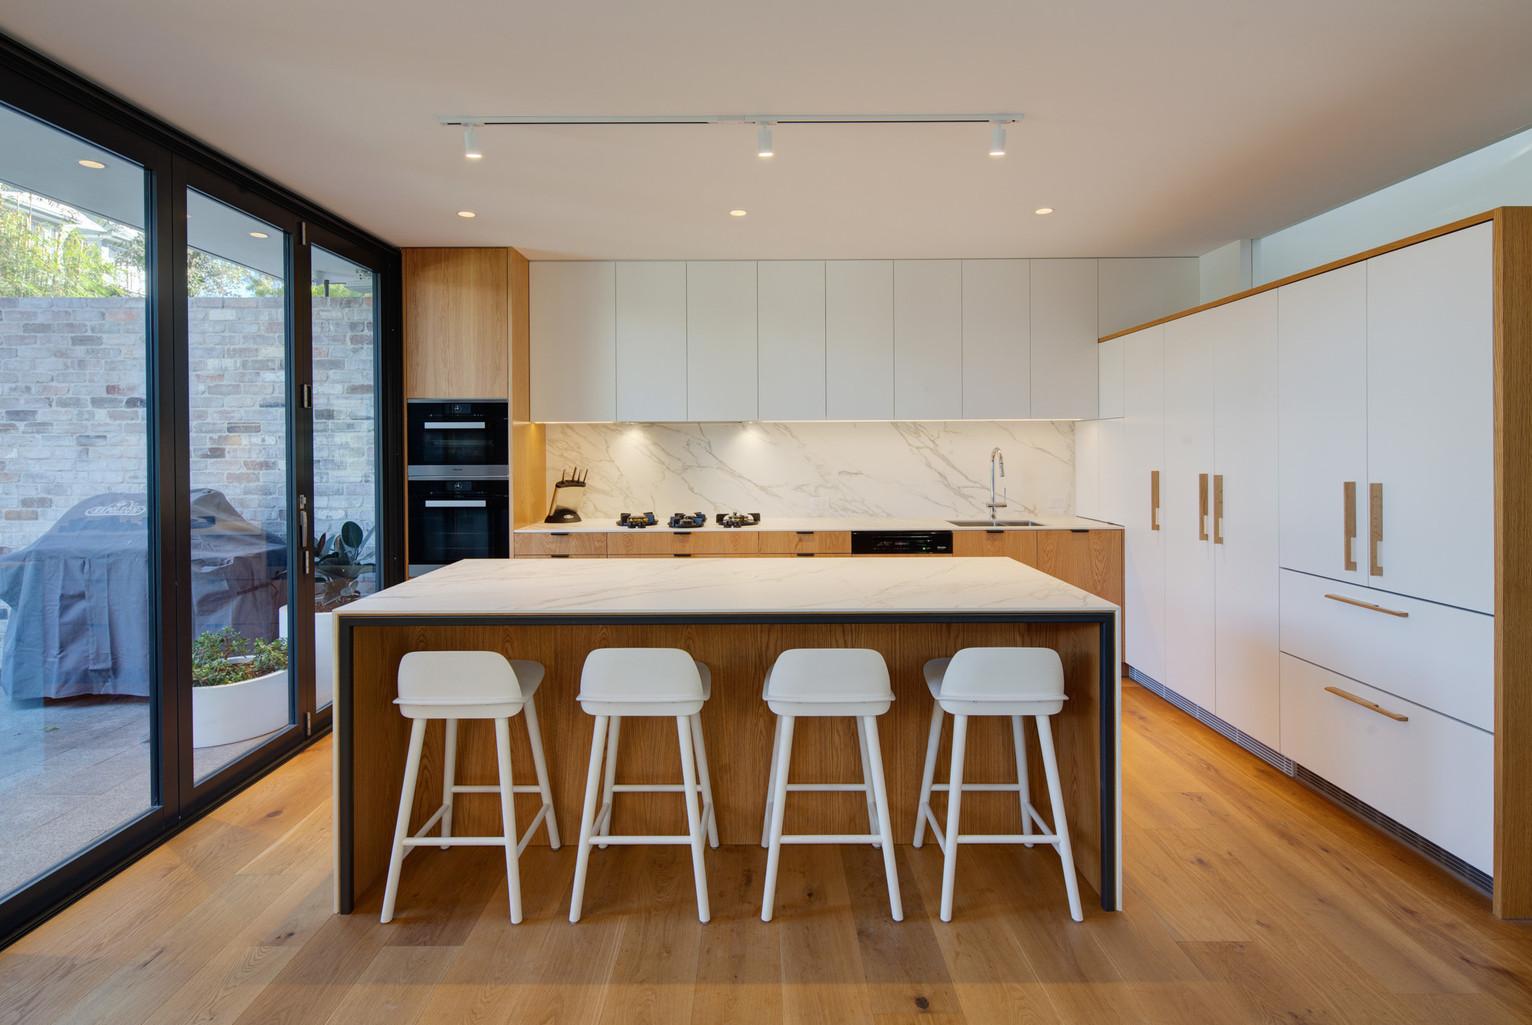 Architectural photography Sydney | Balmain Home Kitchen